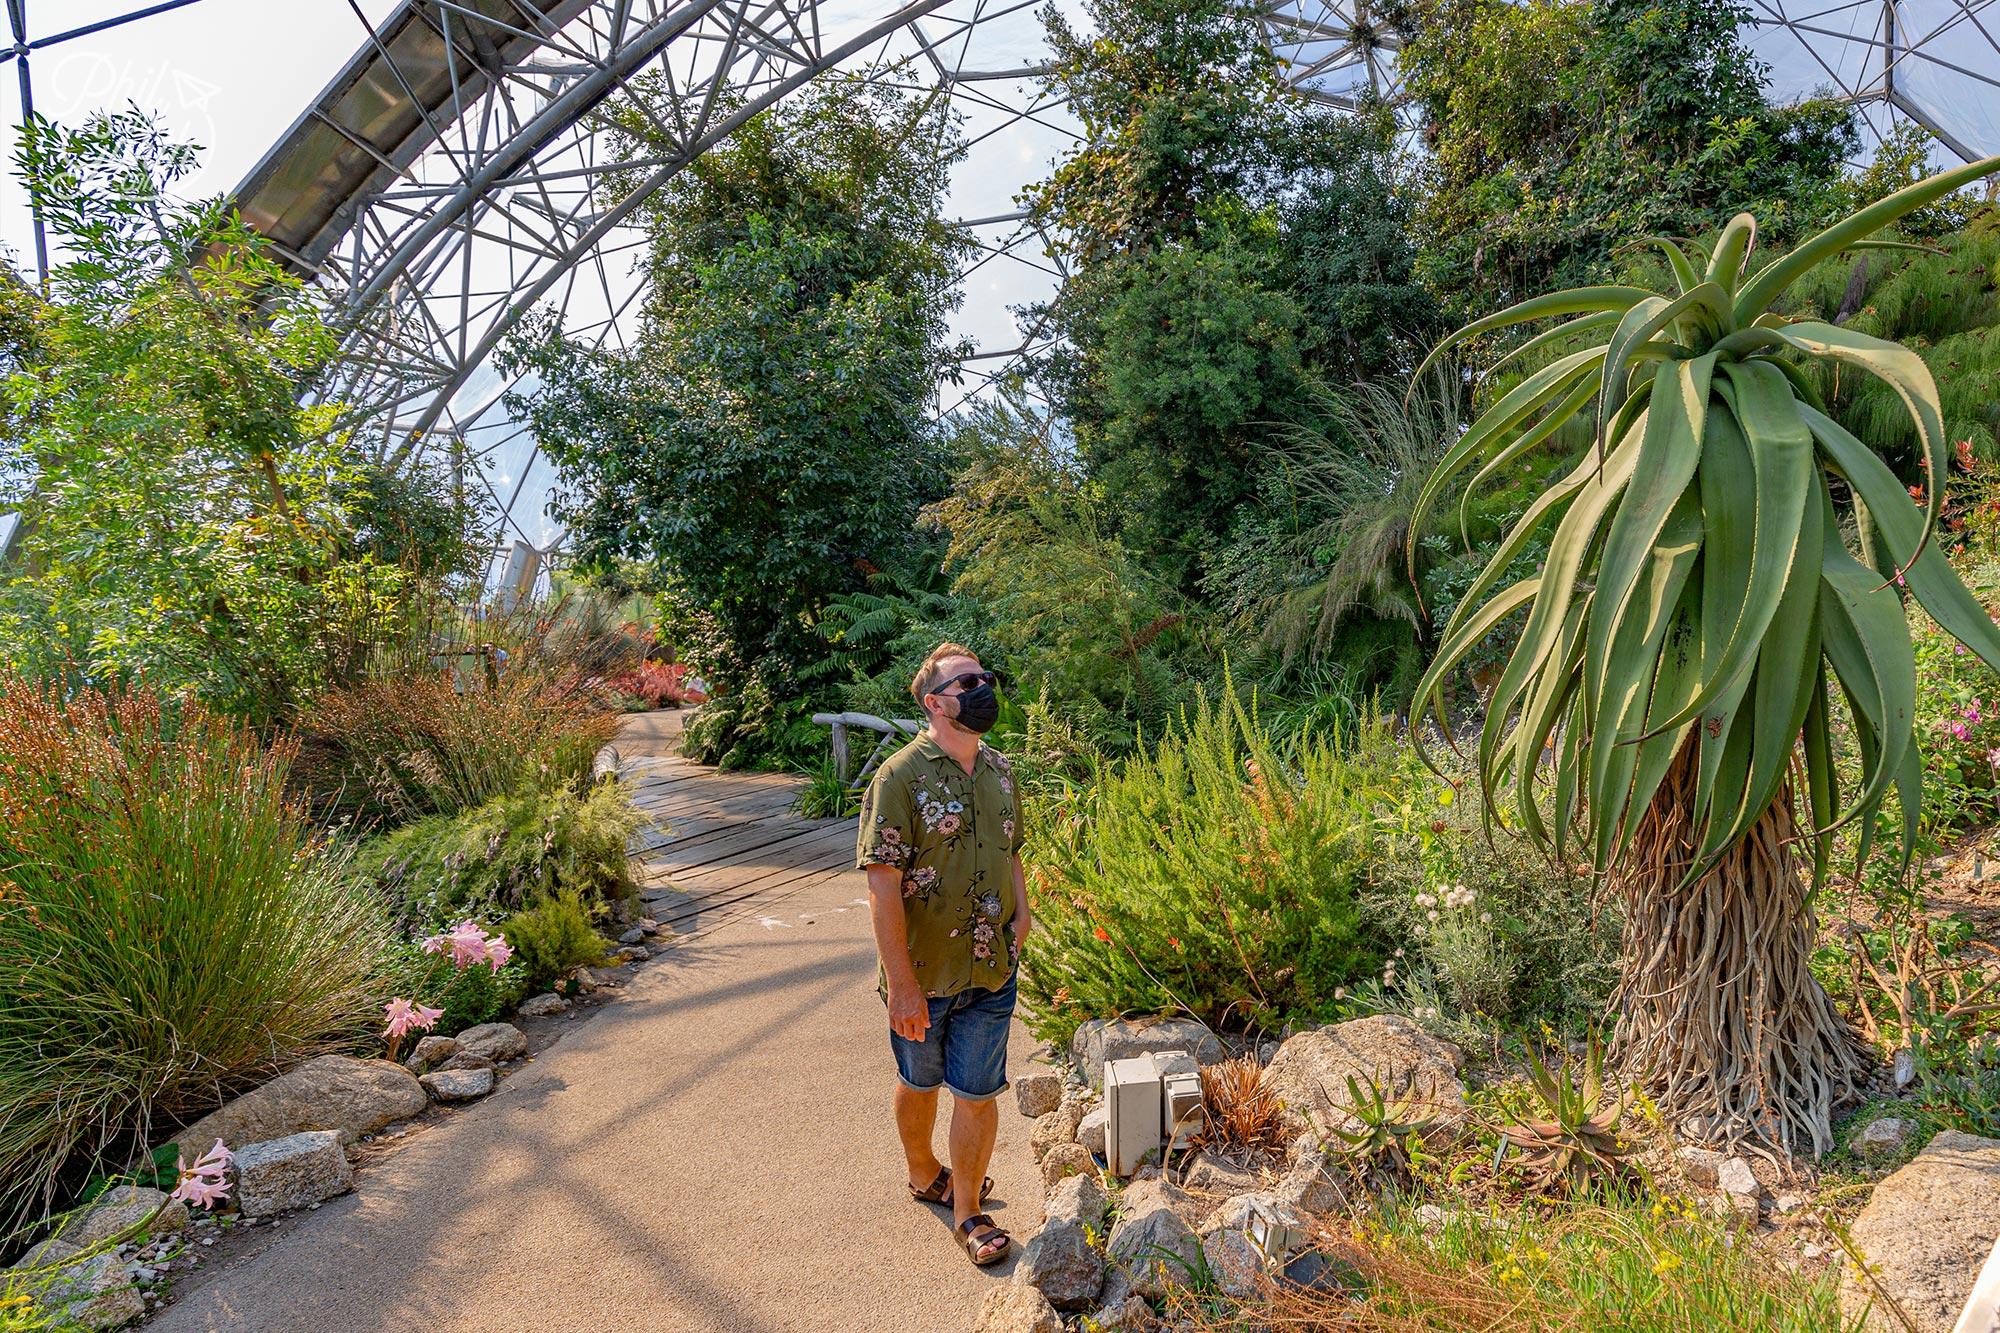 Garth admiring the South Africa garden display in the Mediterranean biome